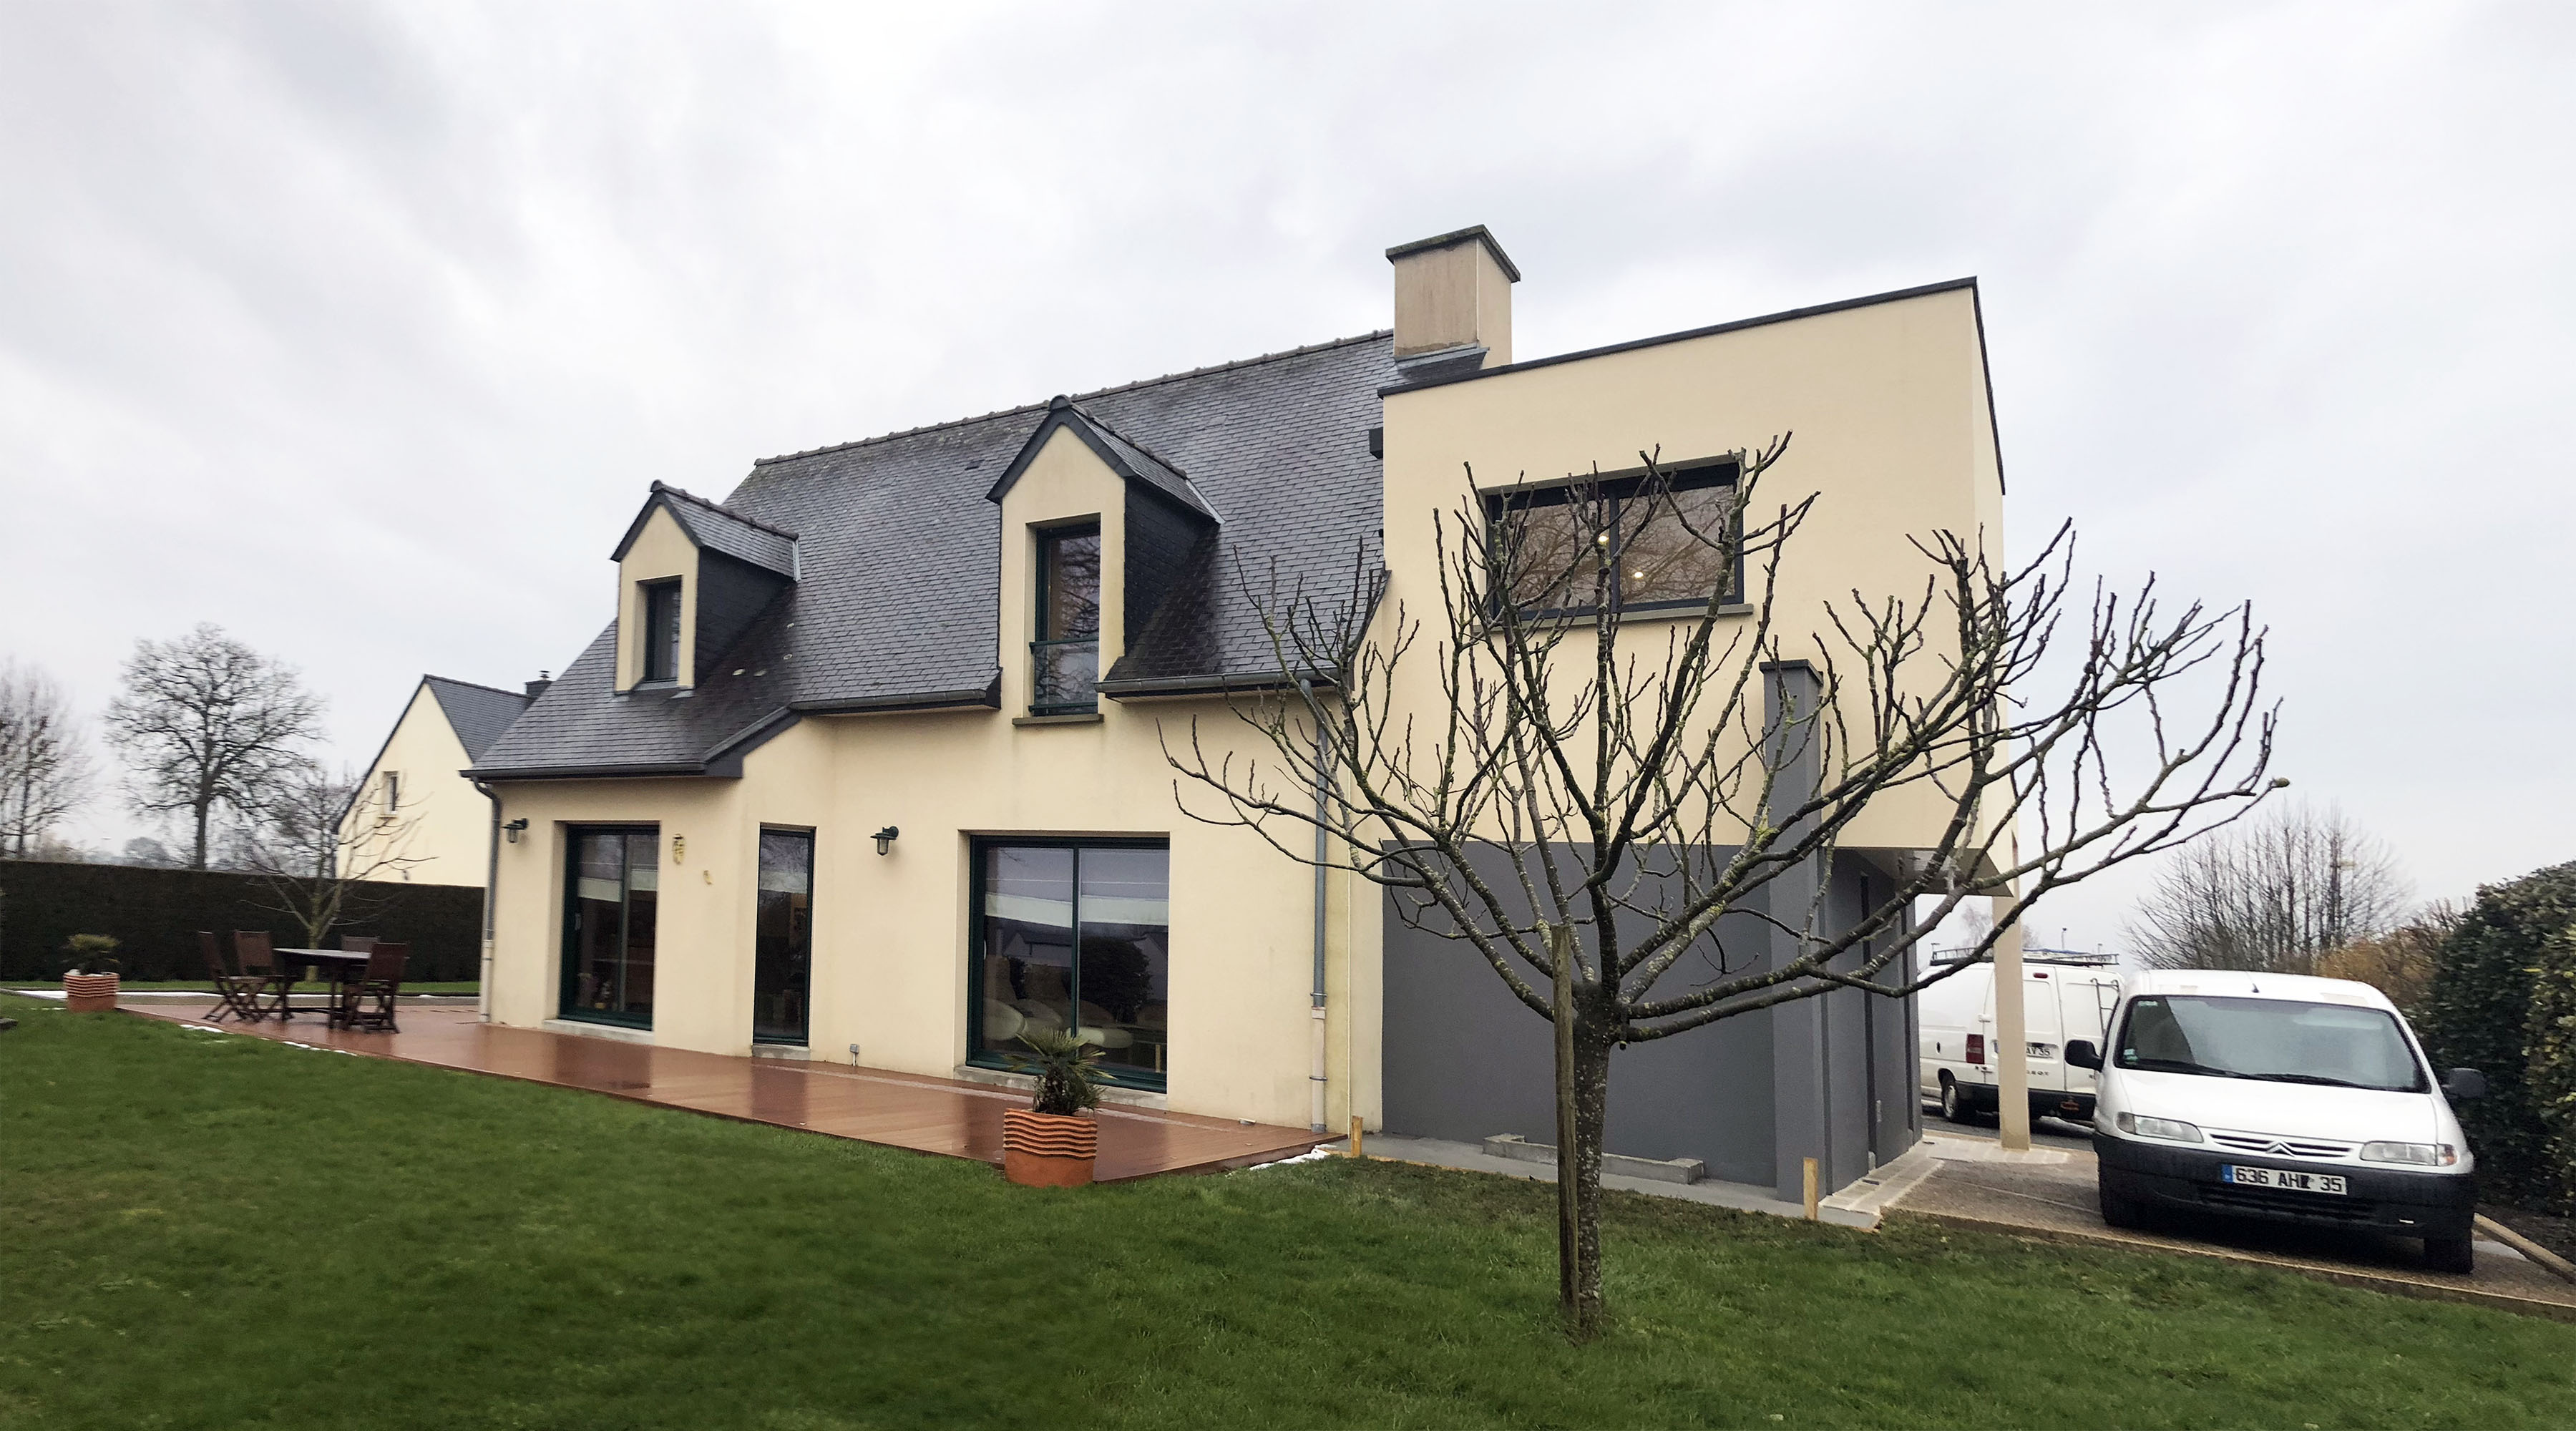 Projet oo sjv 1 2 vue architecte lise roturier for Maison moderne rennes